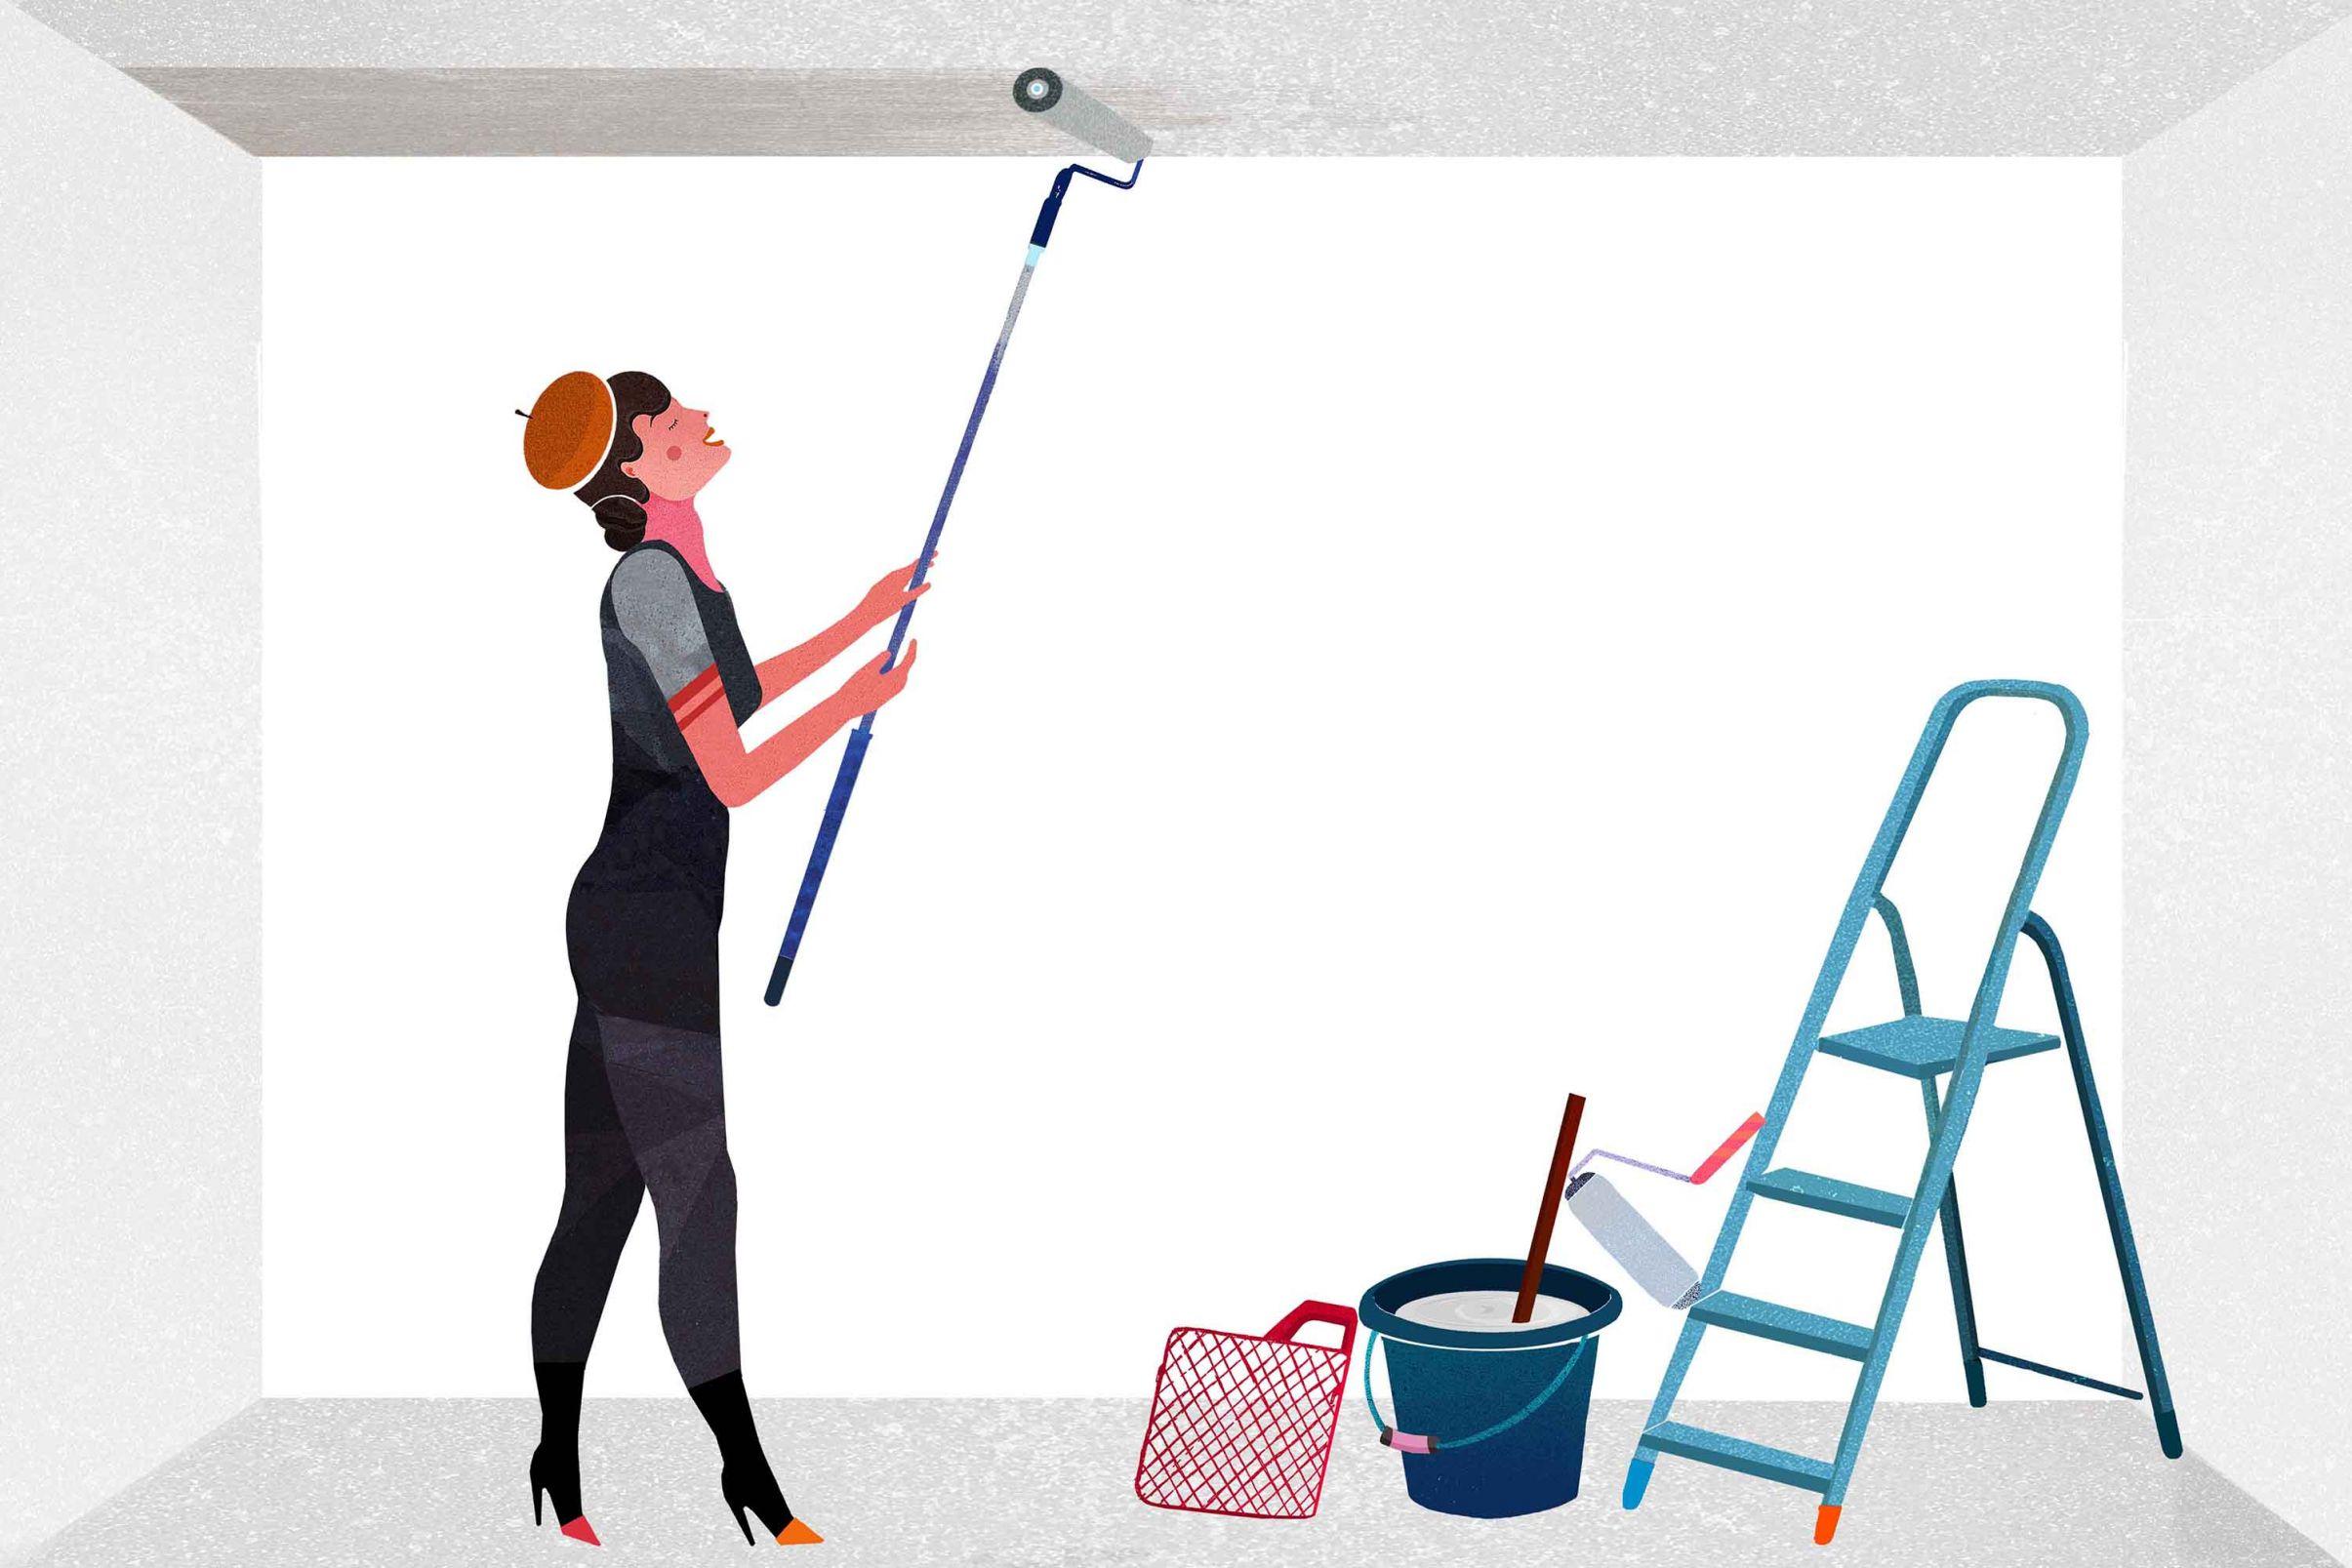 Como-colocar-papel-de-parede-no-teto-Colocar-cola-no-teto